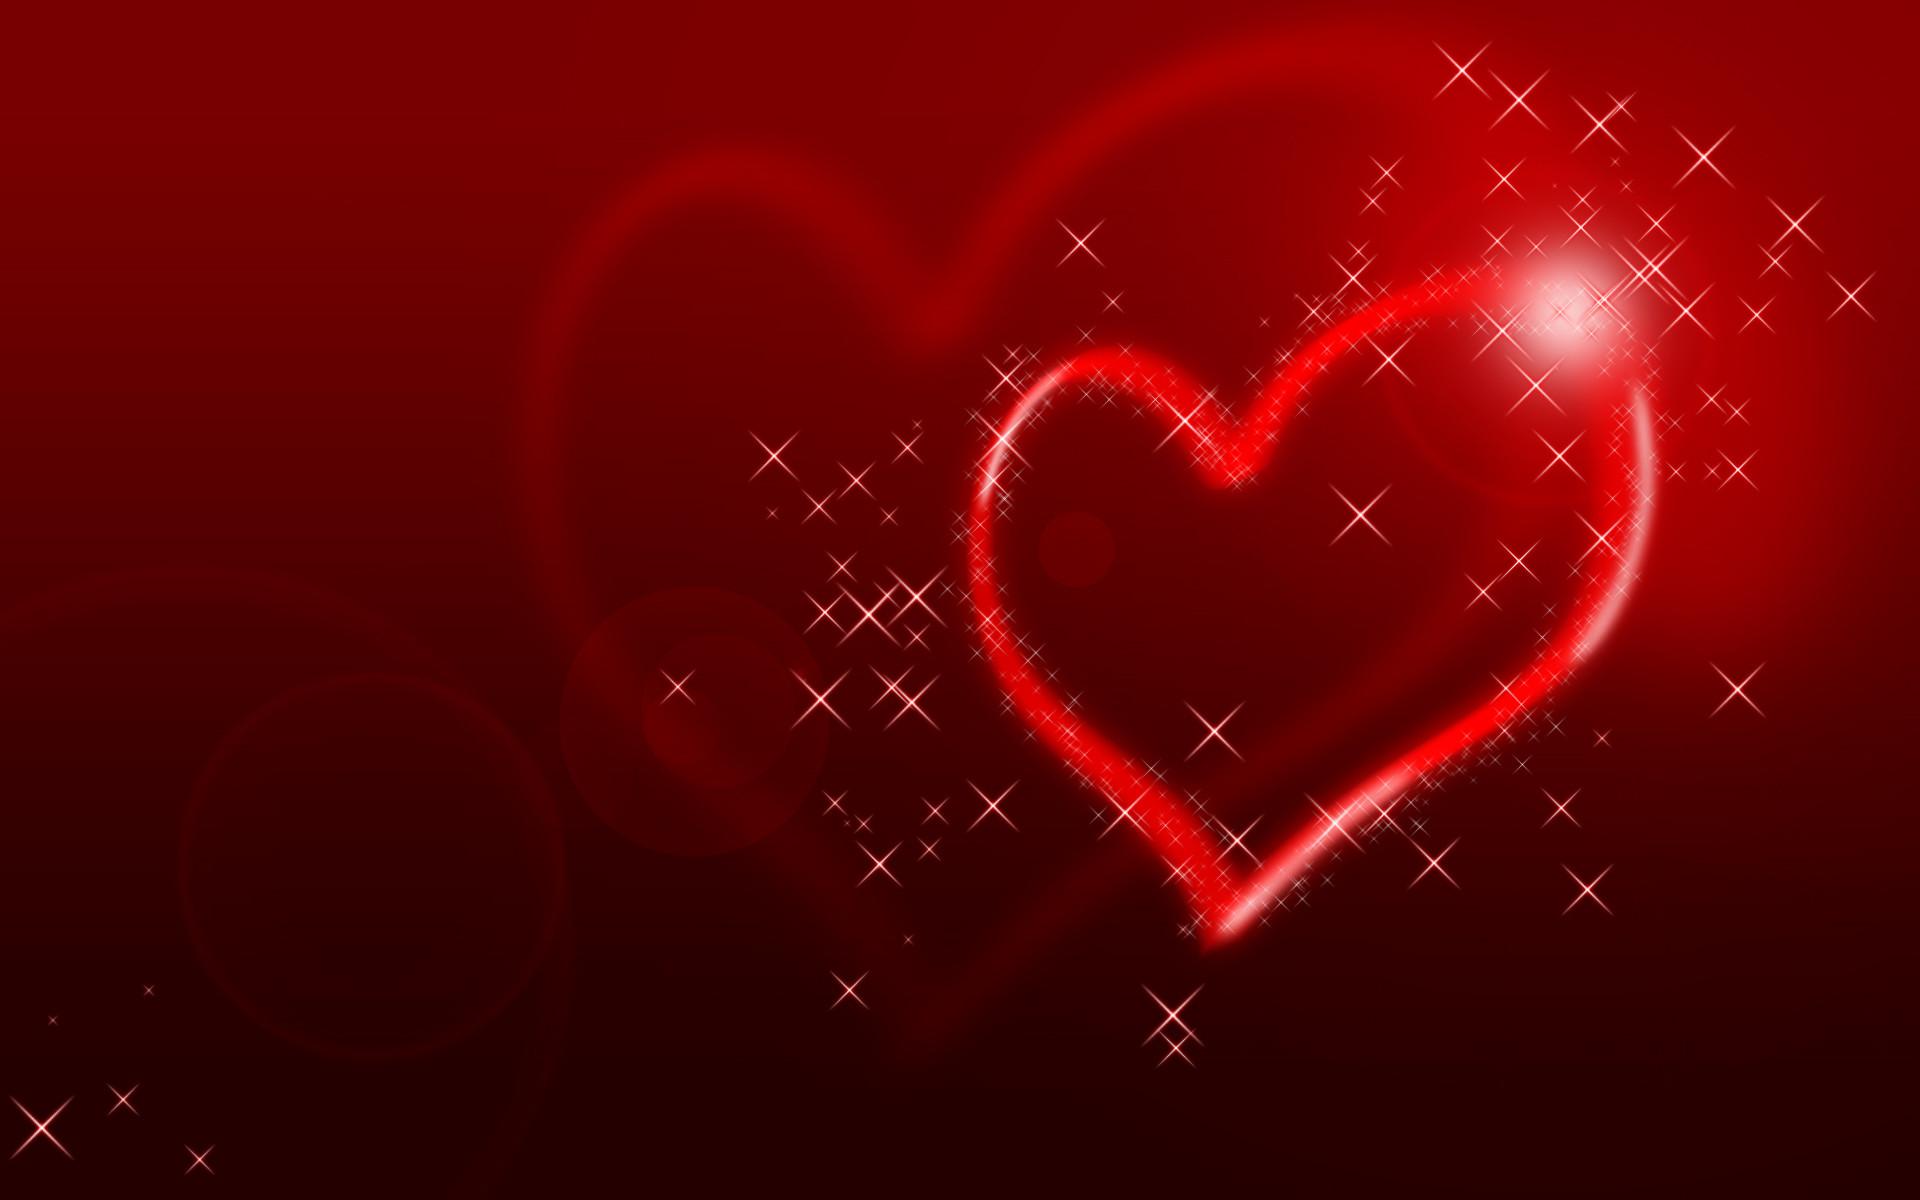 Glittering Heart Wallpapers HD Wallpapers #3828